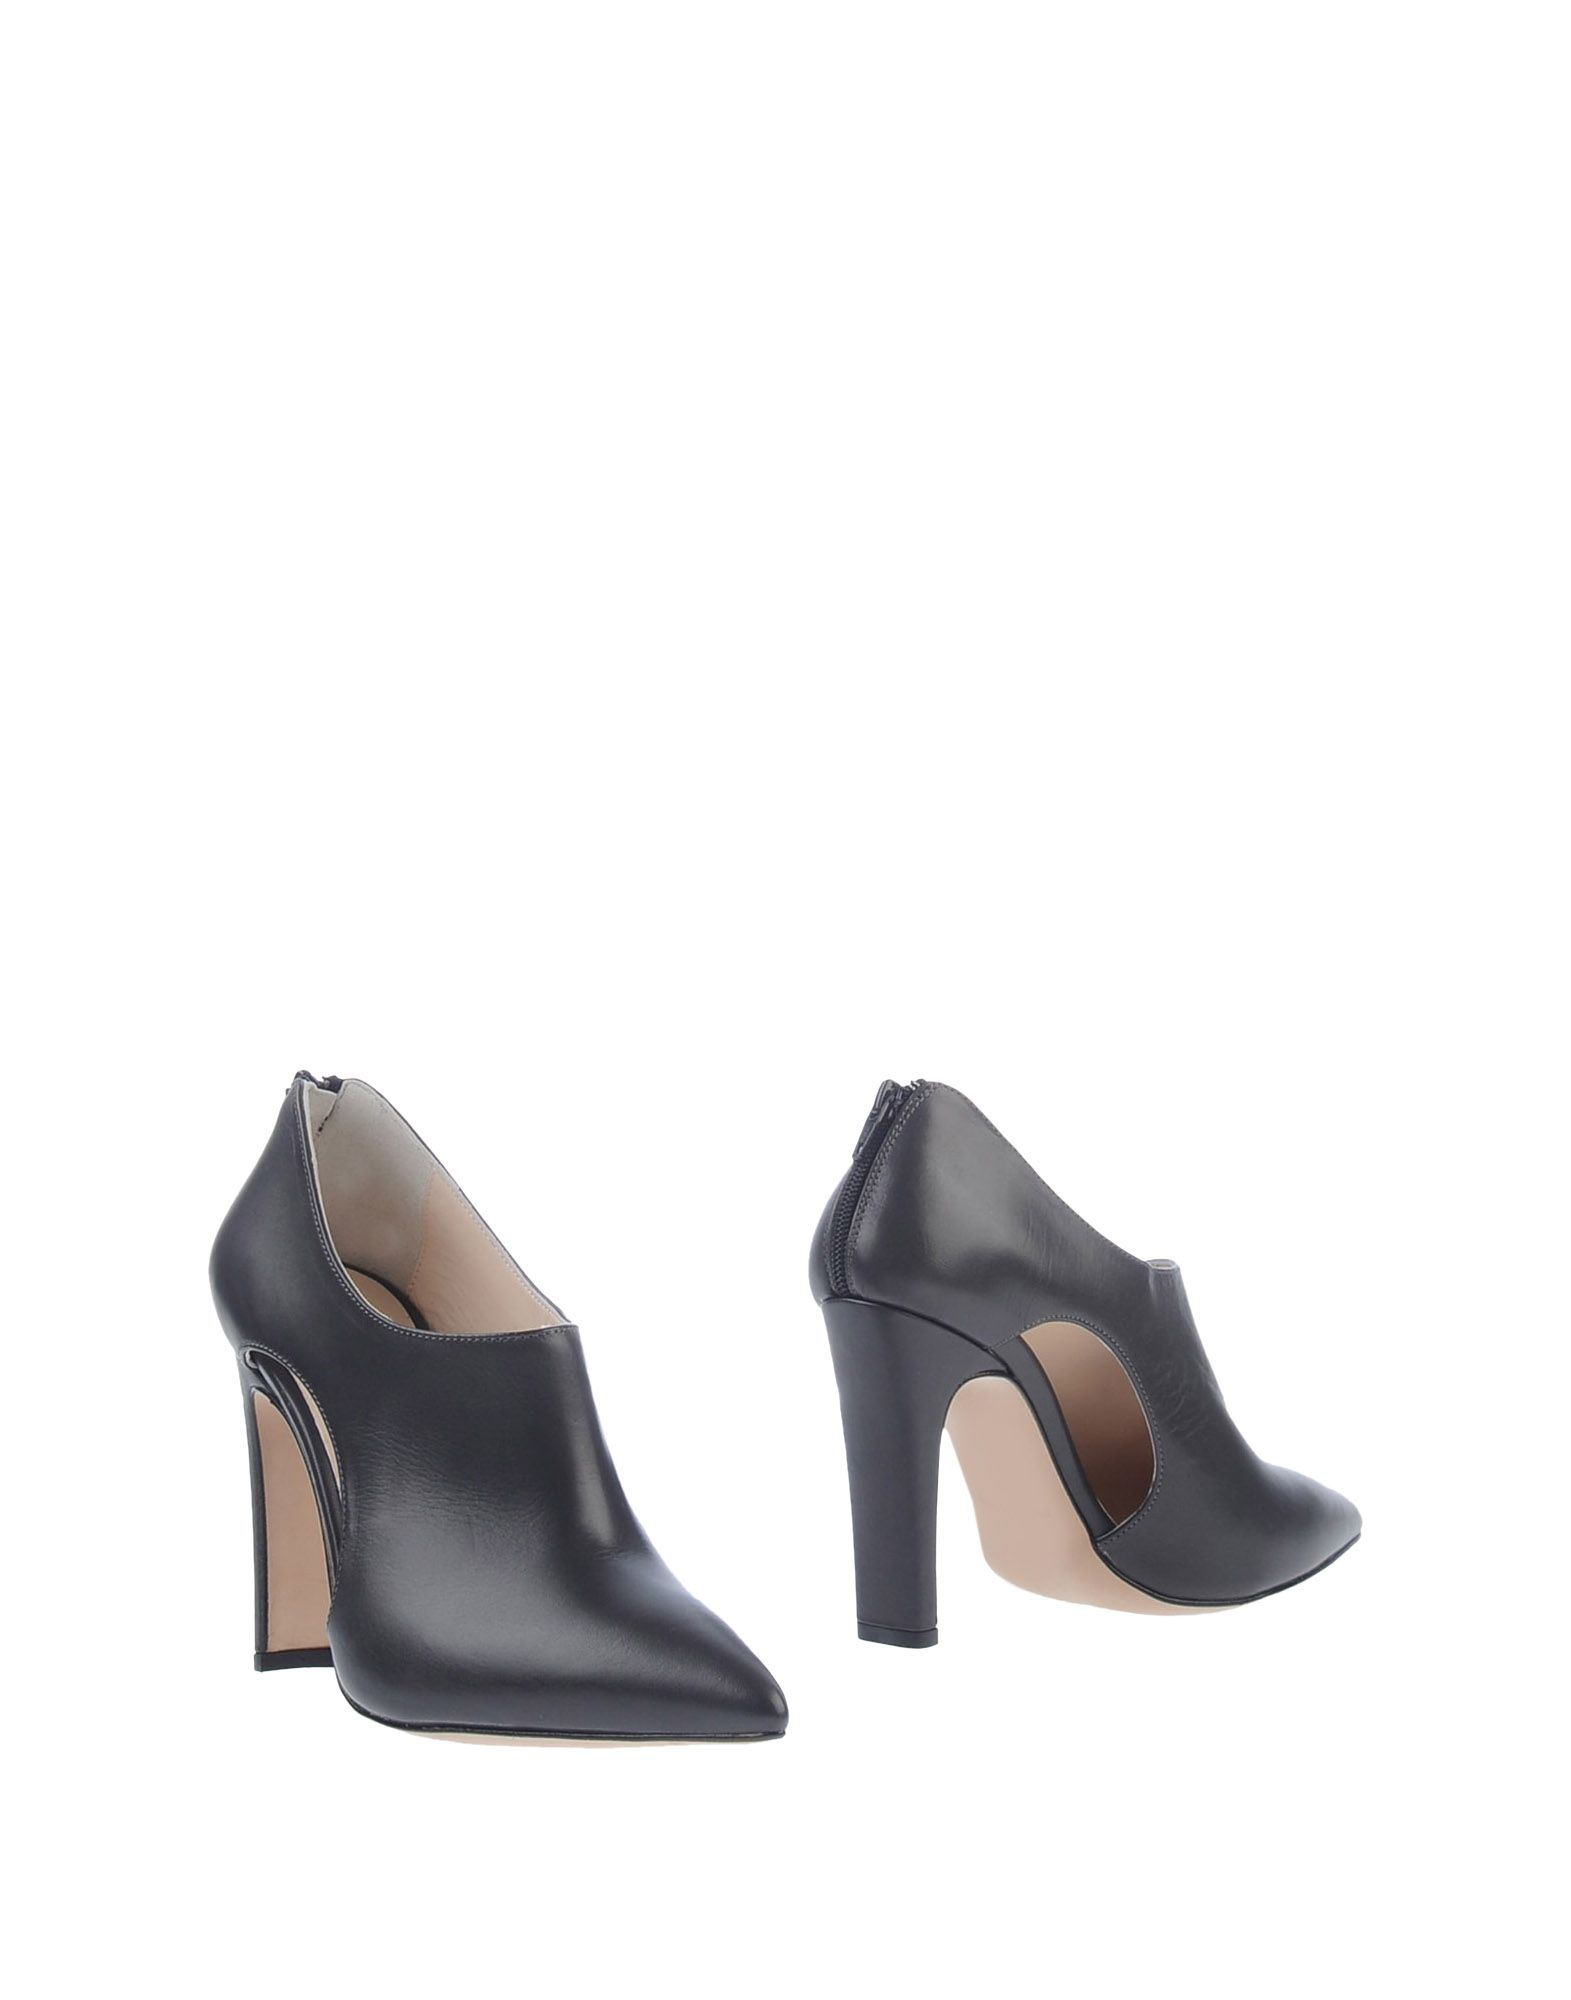 FOOTWEAR - Shoe boots Les Trois Gar?ons K8zK88bTA8